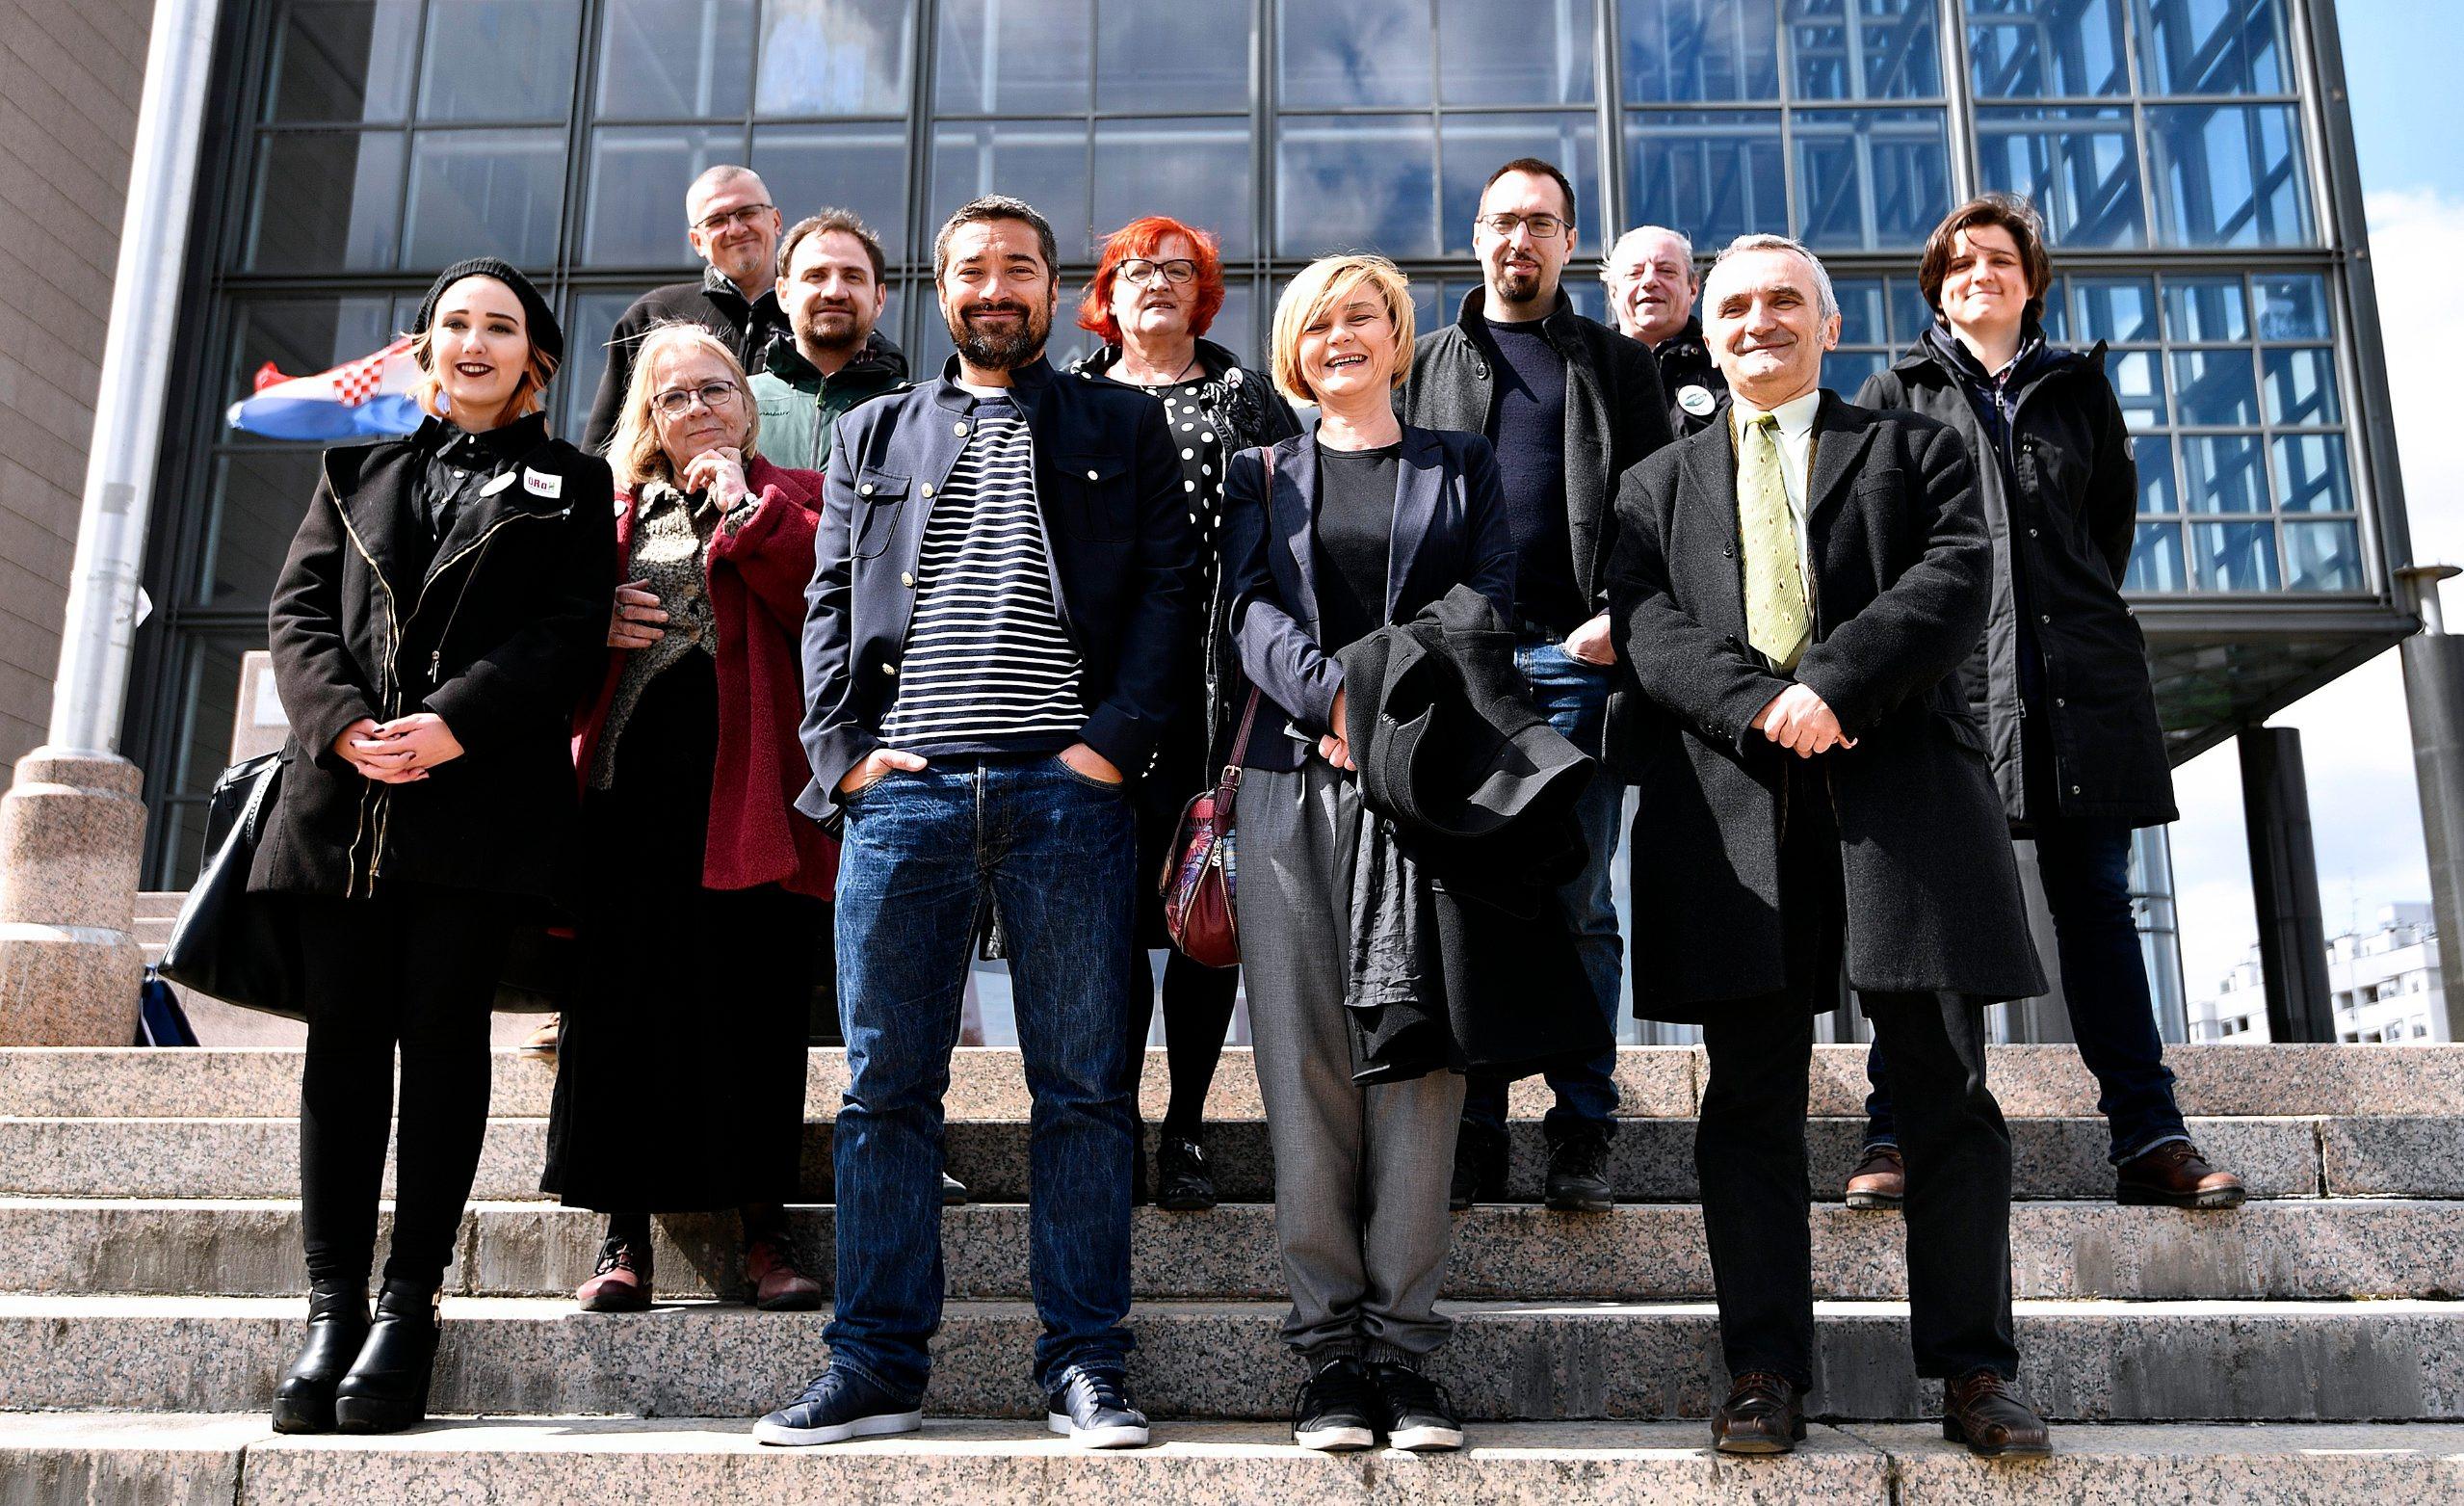 Teodor Celakoski, Dragan Markovina, Rada Borić, Sandra Benčić, Tomislav Tomašević, Zorislav Antun Petrović